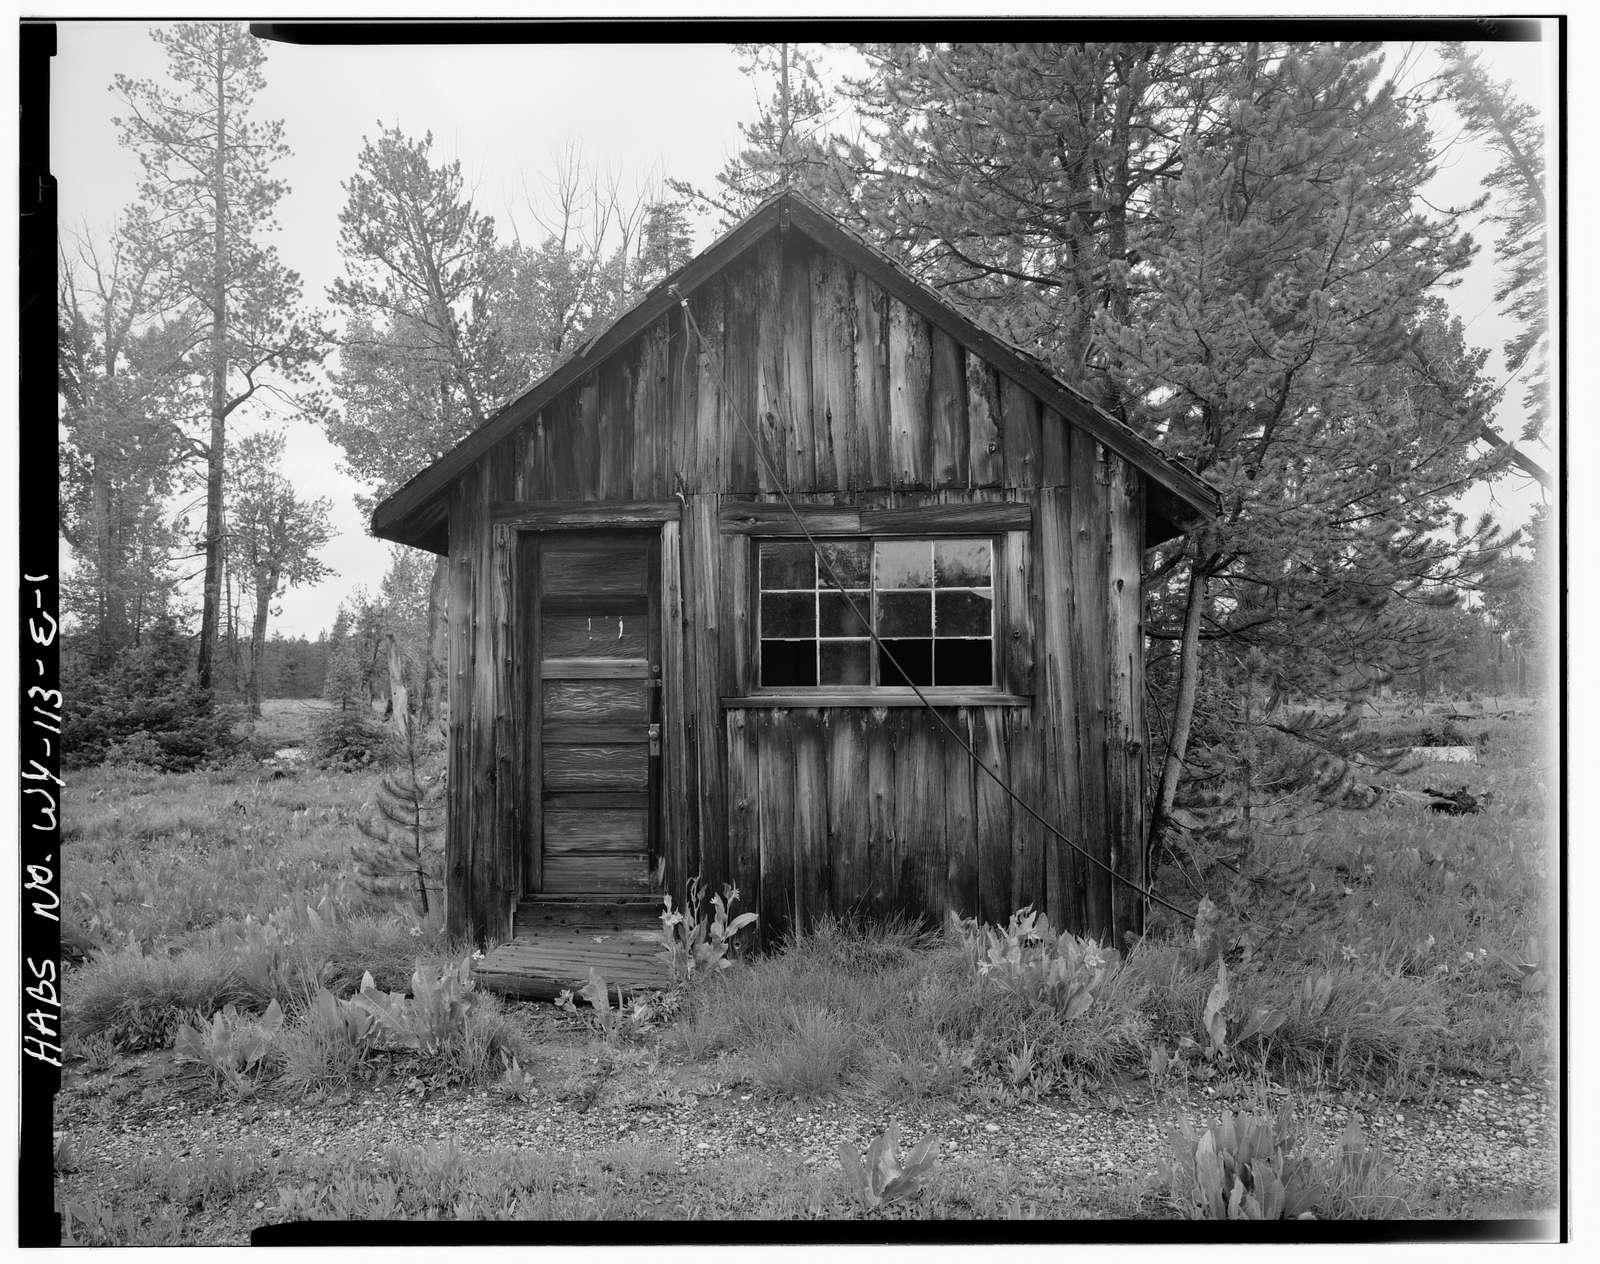 Geraldine Lucas Homestead, Guest Cabin, West bank Cottonwood Creek, 2.5 miles downstream from Jenny Lake, Moose, Teton County, WY